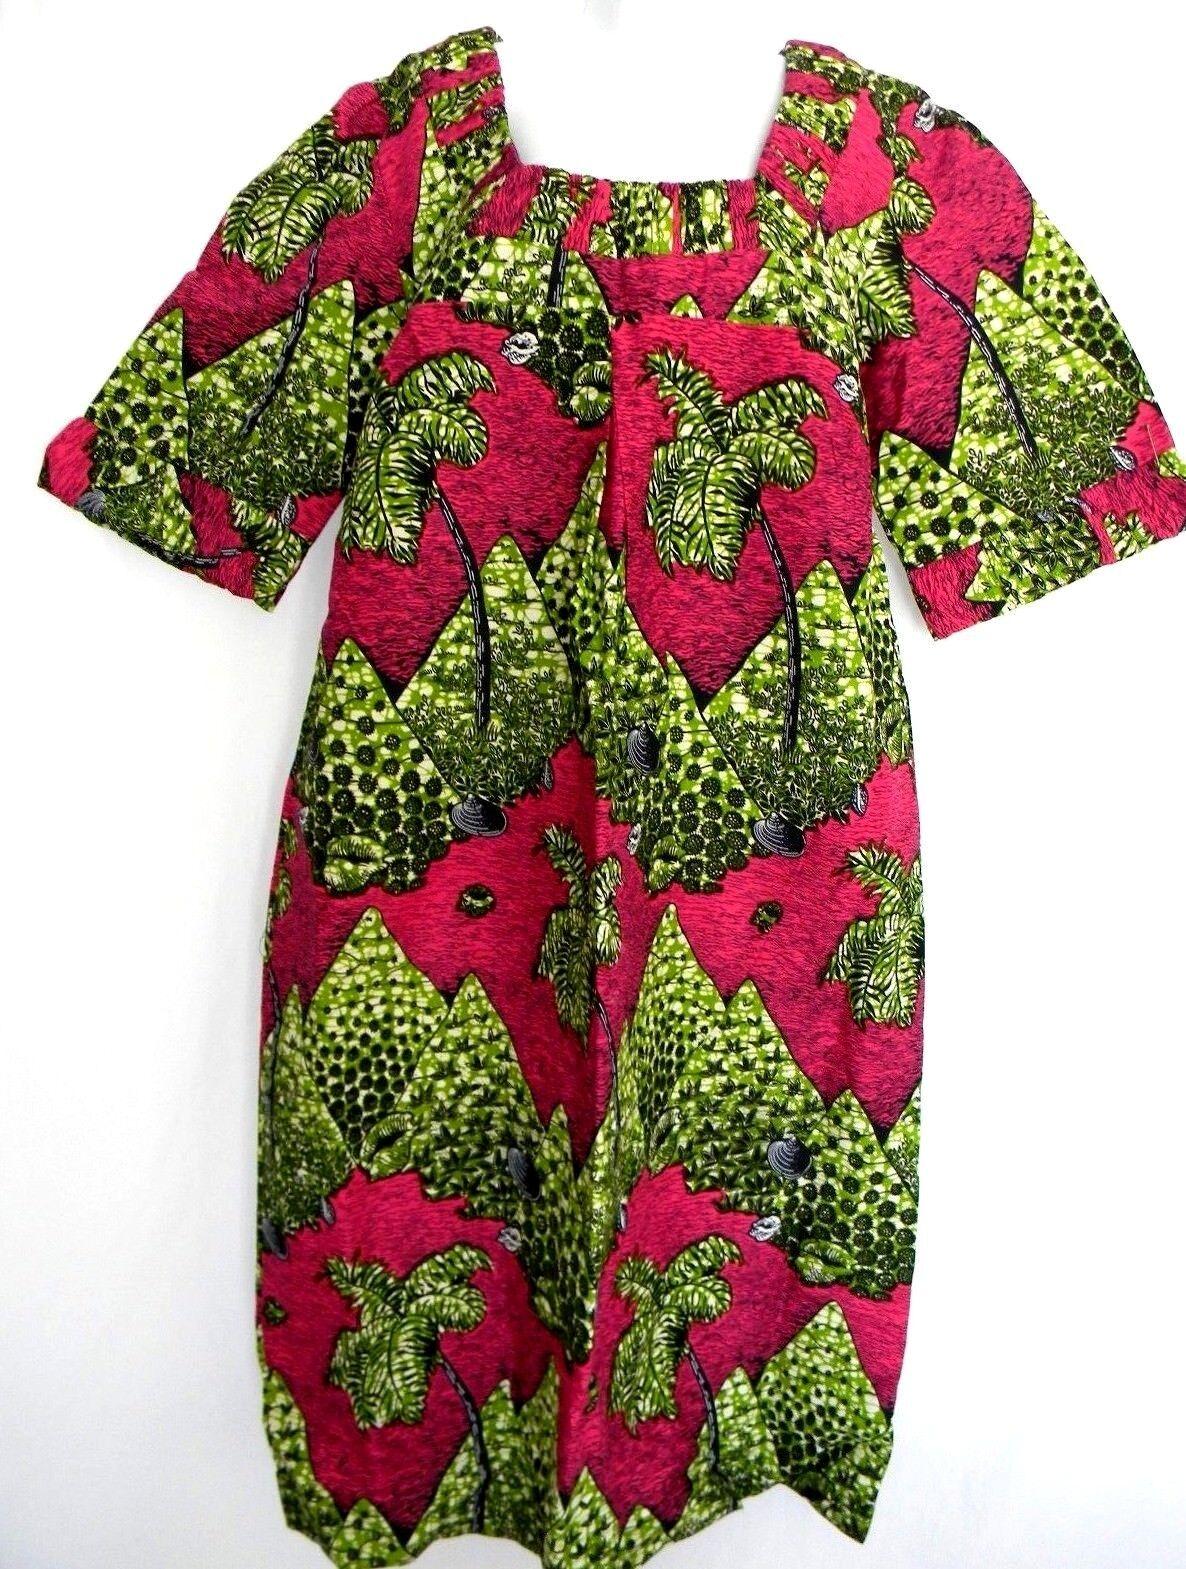 African Wax Größe XL Maxi Dress damen Detail Square Neckline & Cuffs Ankara Dress